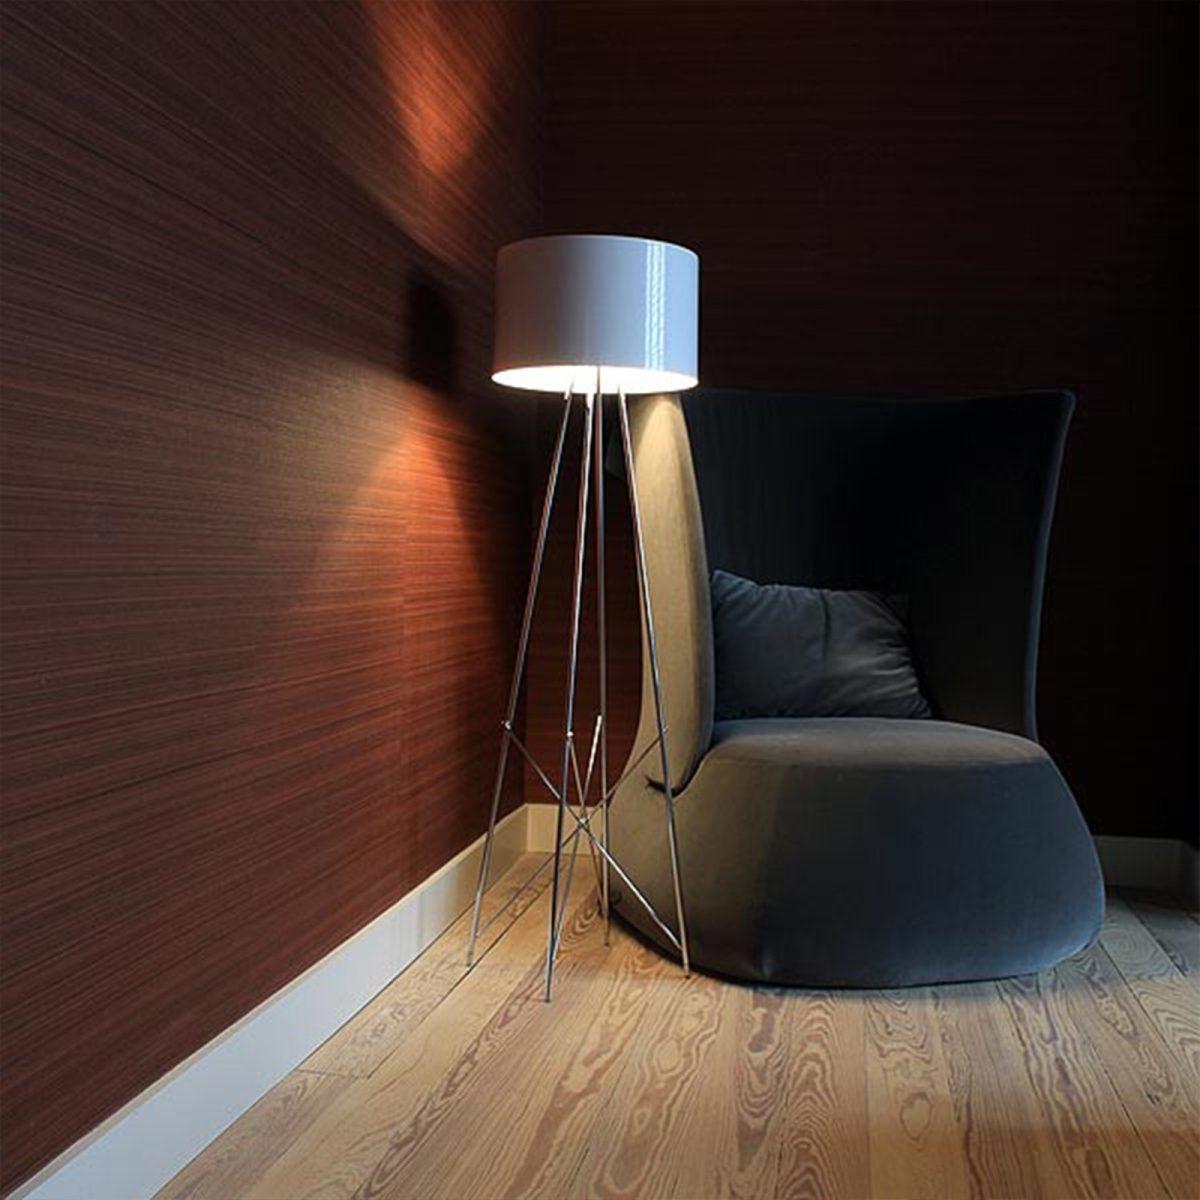 ray-f1-f2-floor-lamp-flosz